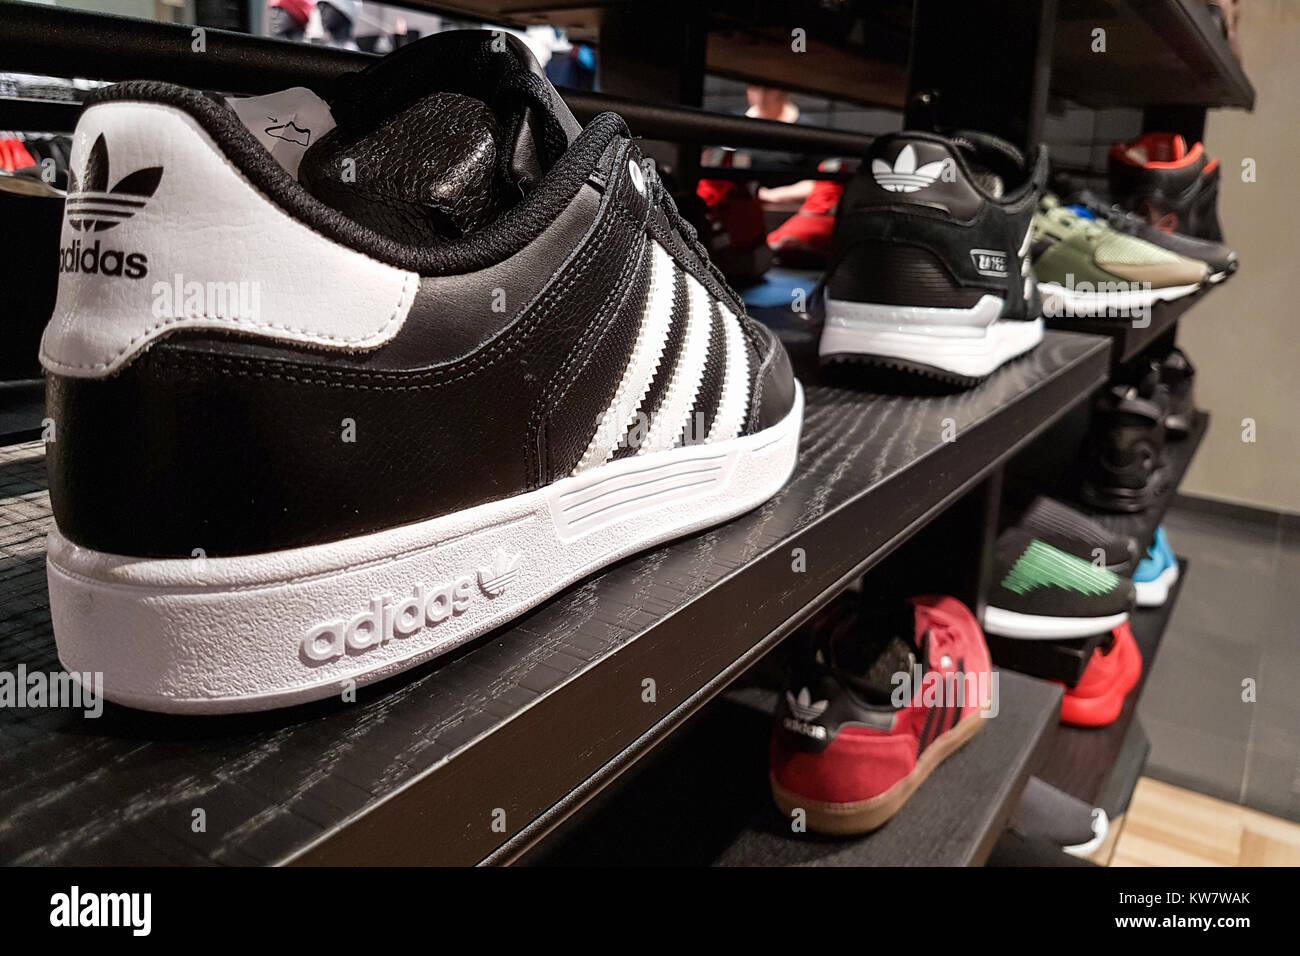 Lubin, Poland - November 17, 2017: Collection of trendy Adidas ...